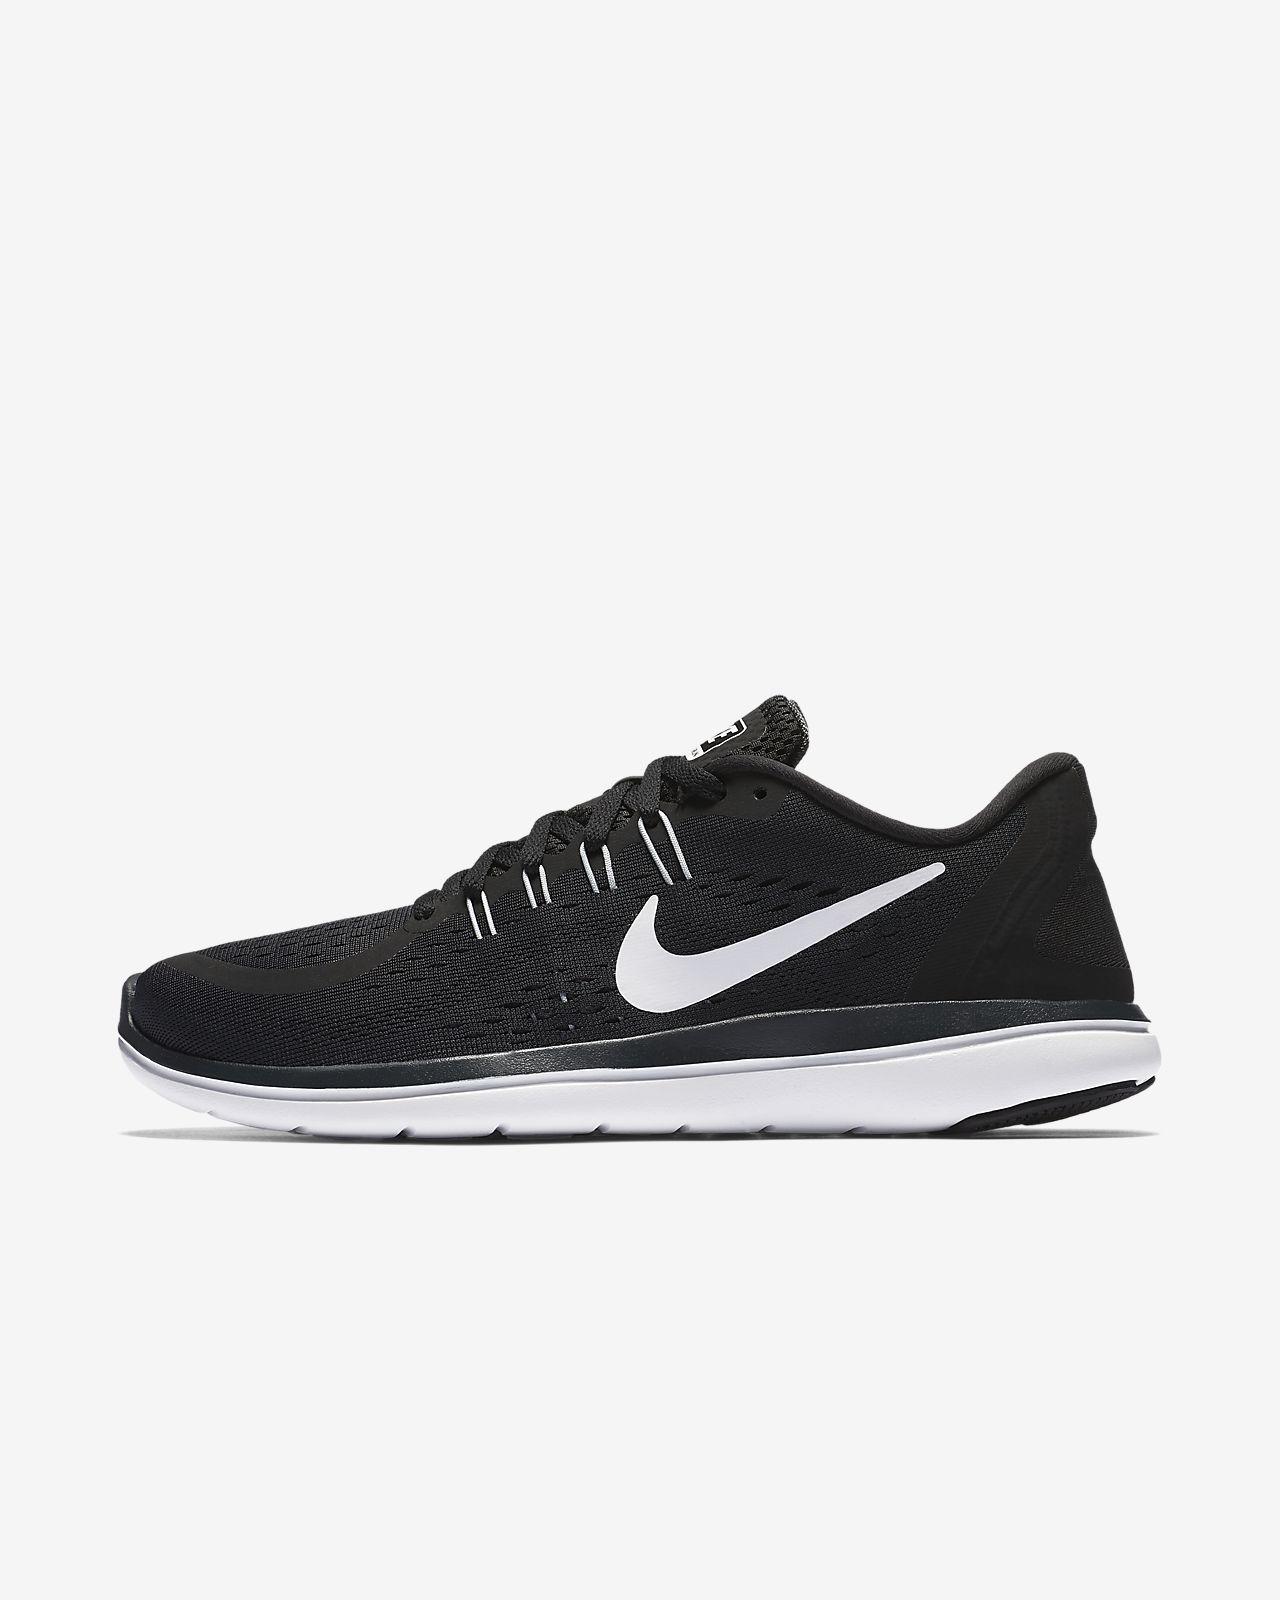 buy online 39a70 6c70e ... Calzado de running para mujer Nike Flex 2017 RN